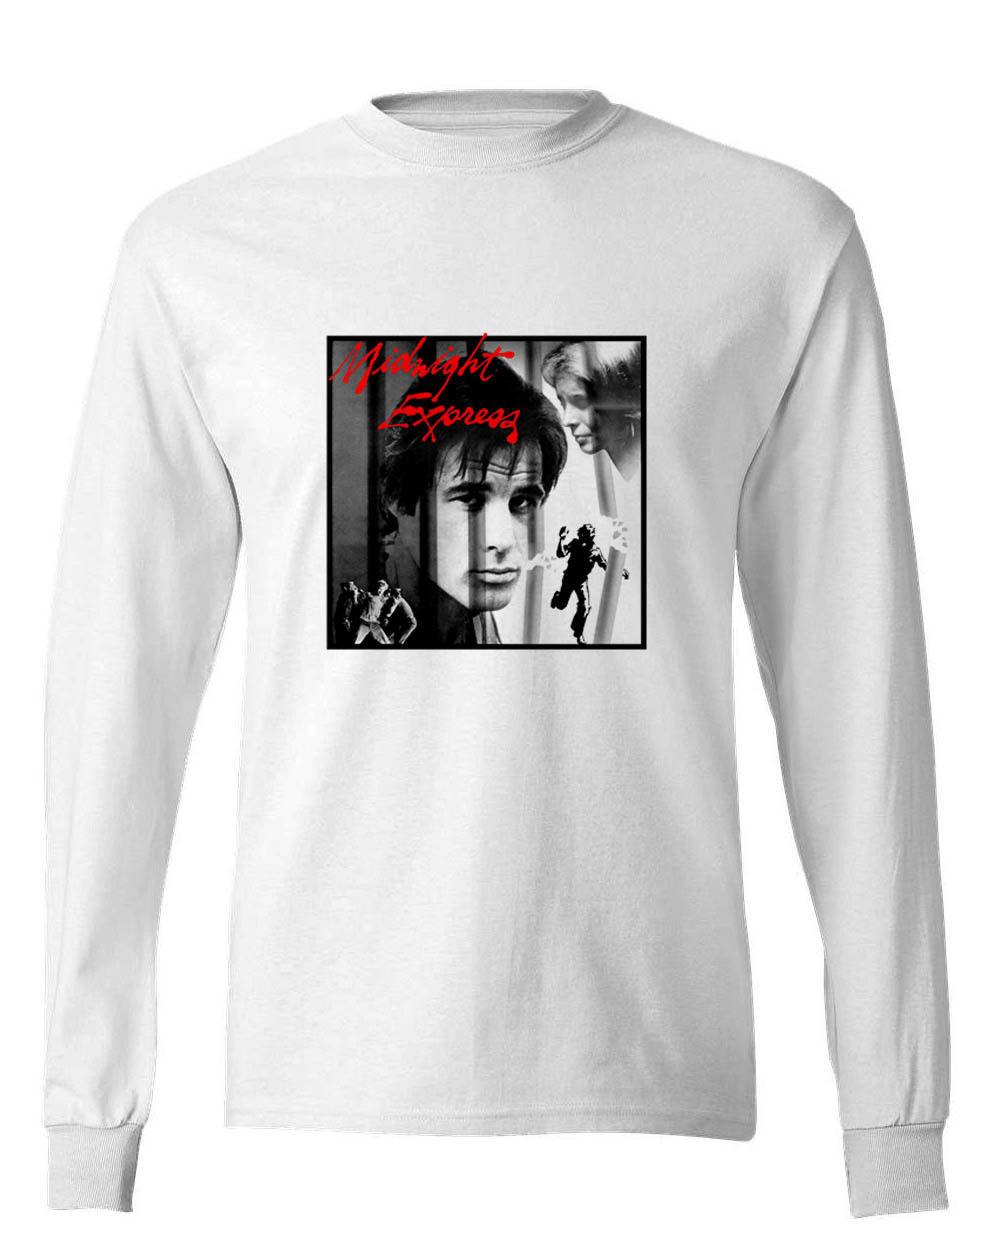 Midnight express tee shirt retro 70 s movie t shirt graphic long sleeve